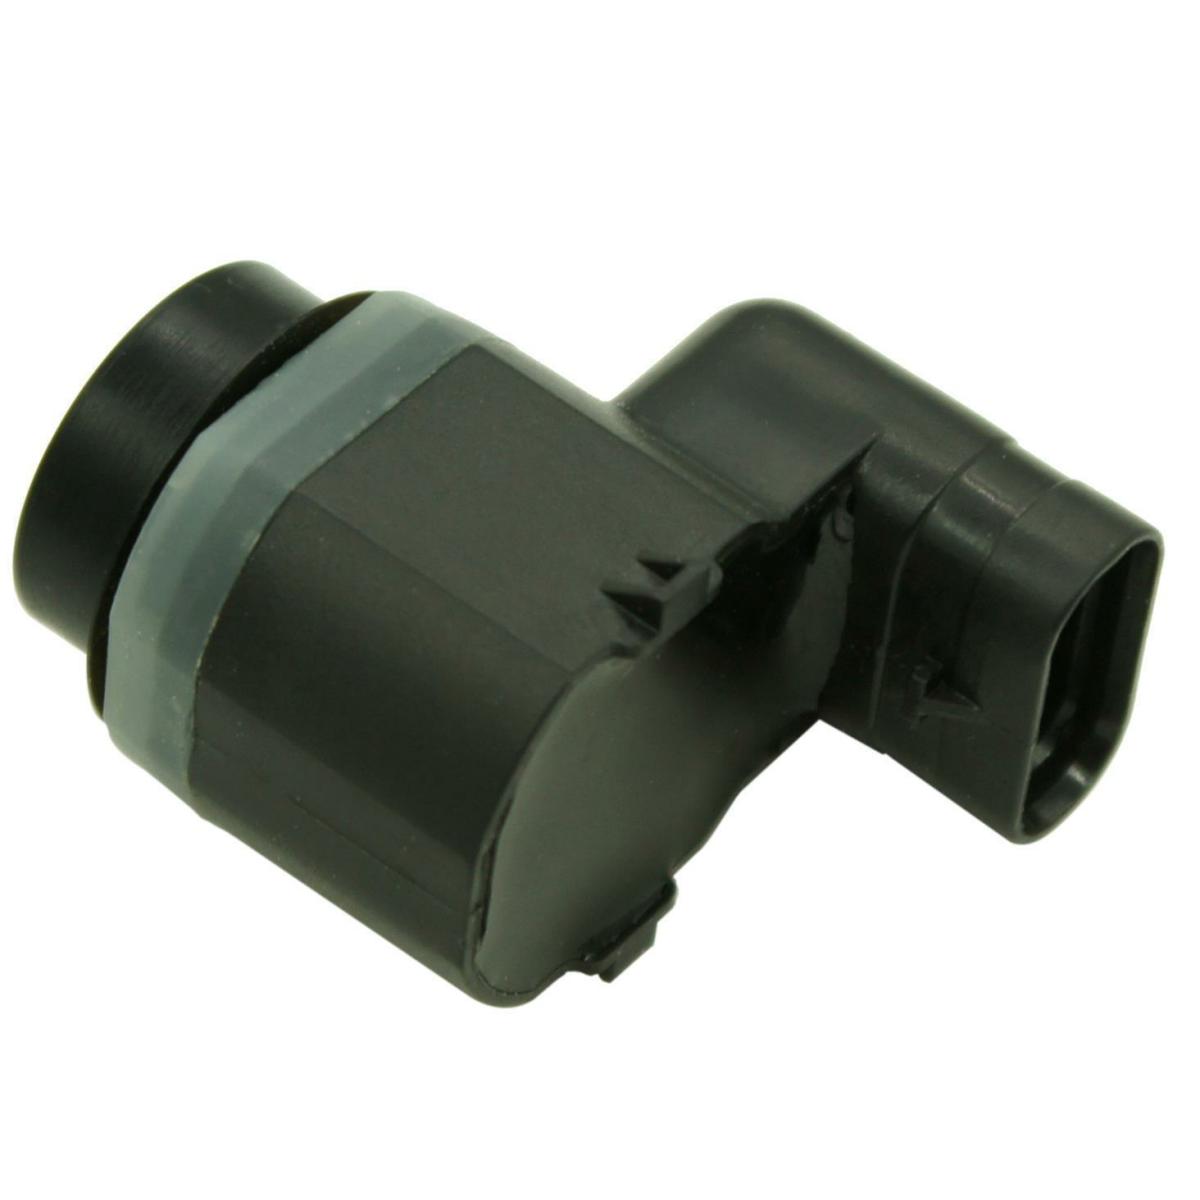 Parktronic PDC Parking Sensor 3TD919275A for Skoda